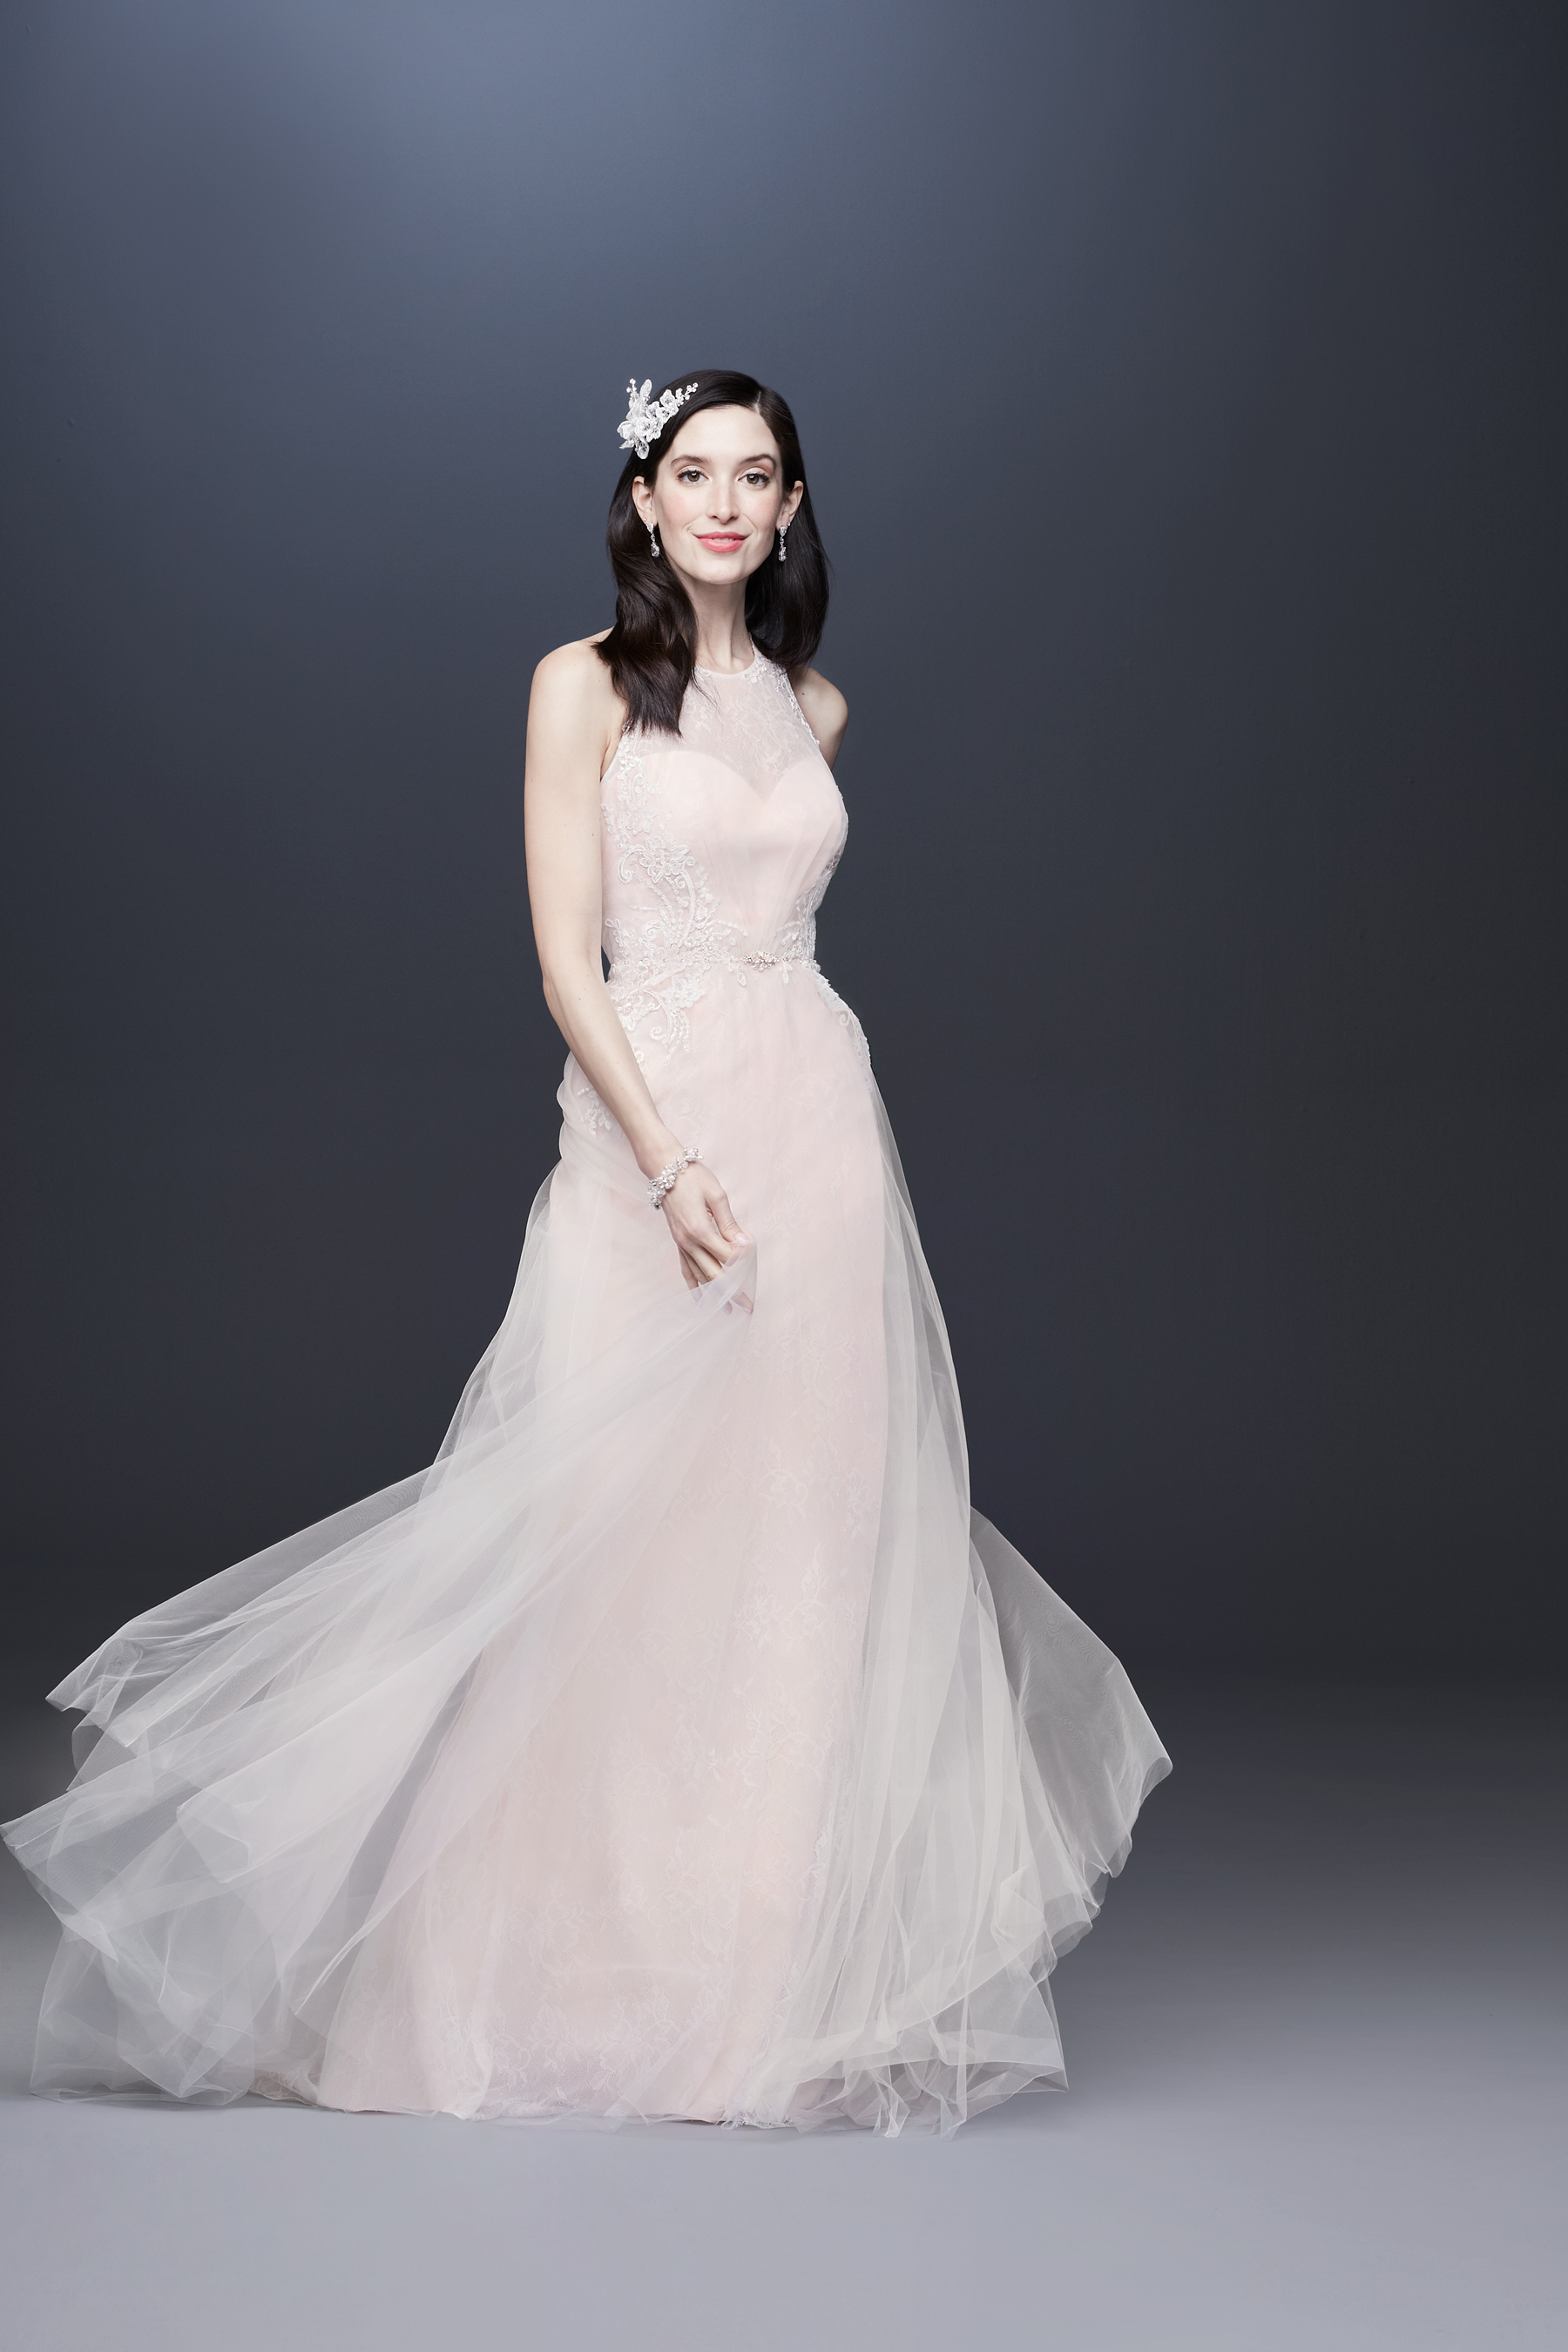 illusion high neck sleeveless tulle skirt a-line wedding dress Davids Bridal Spring 2020